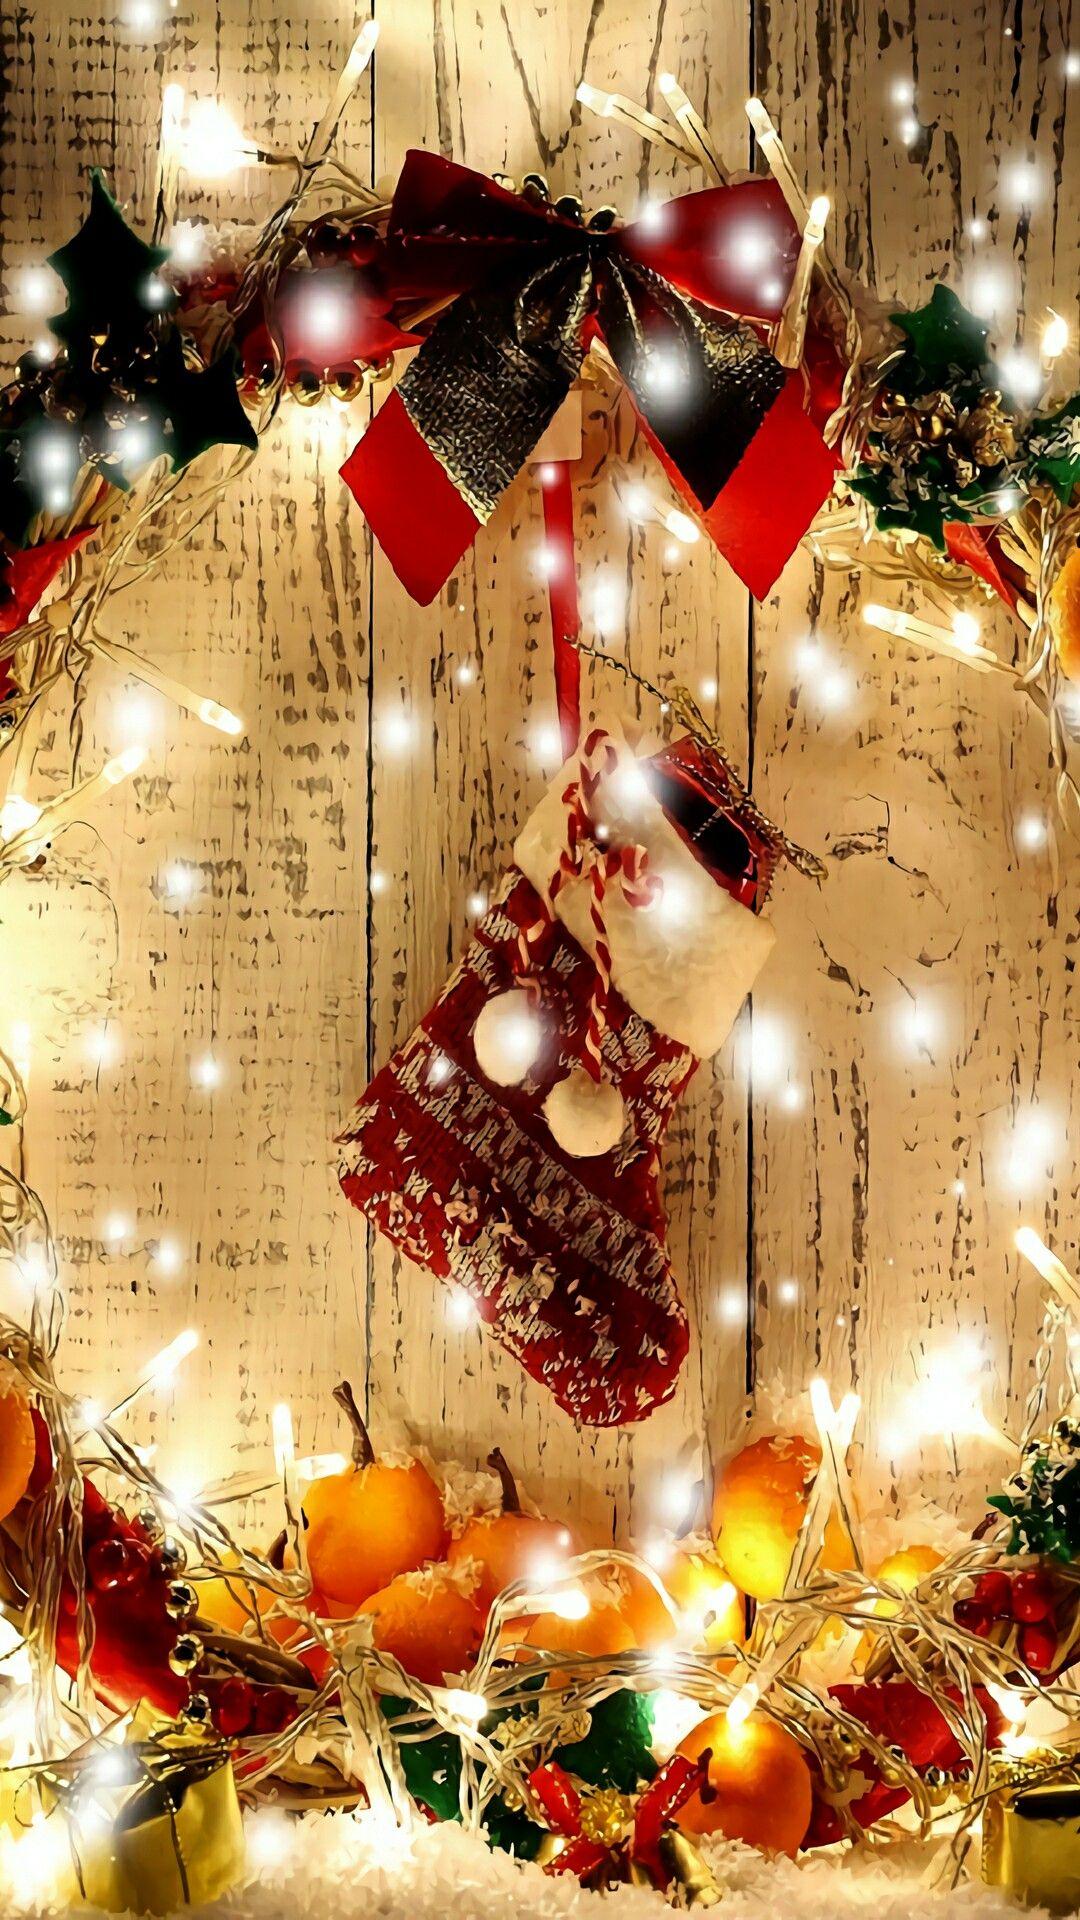 Via Zedge Merry Christmas Wallpaper Wallpaper Iphone Christmas Christmas Wallpaper